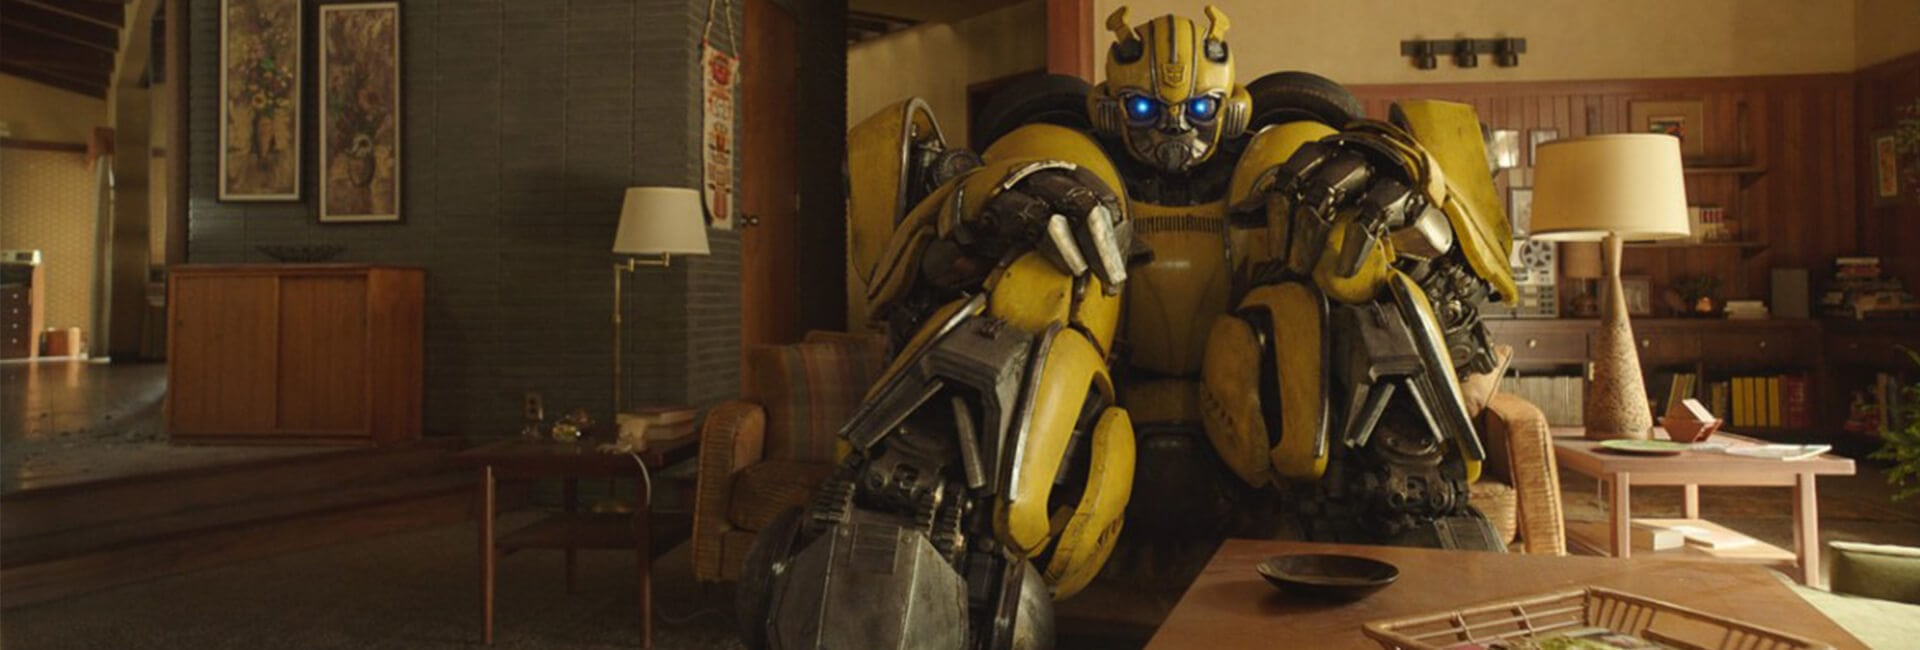 bumblebee retro night, bumblebee movie, retro game night, movie event